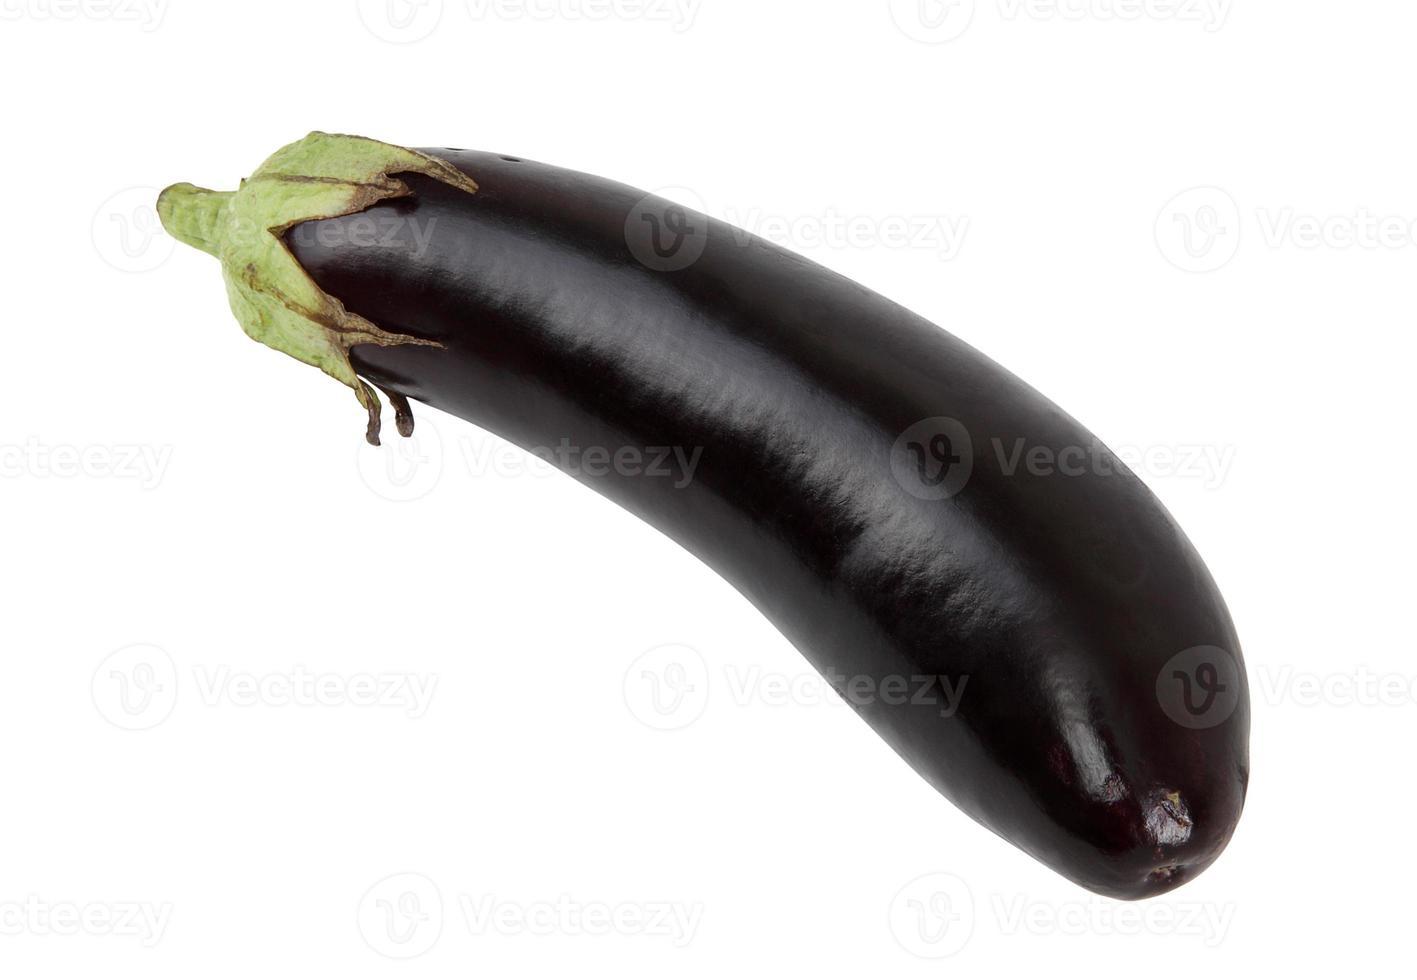 Eggplant +Clipping Path photo